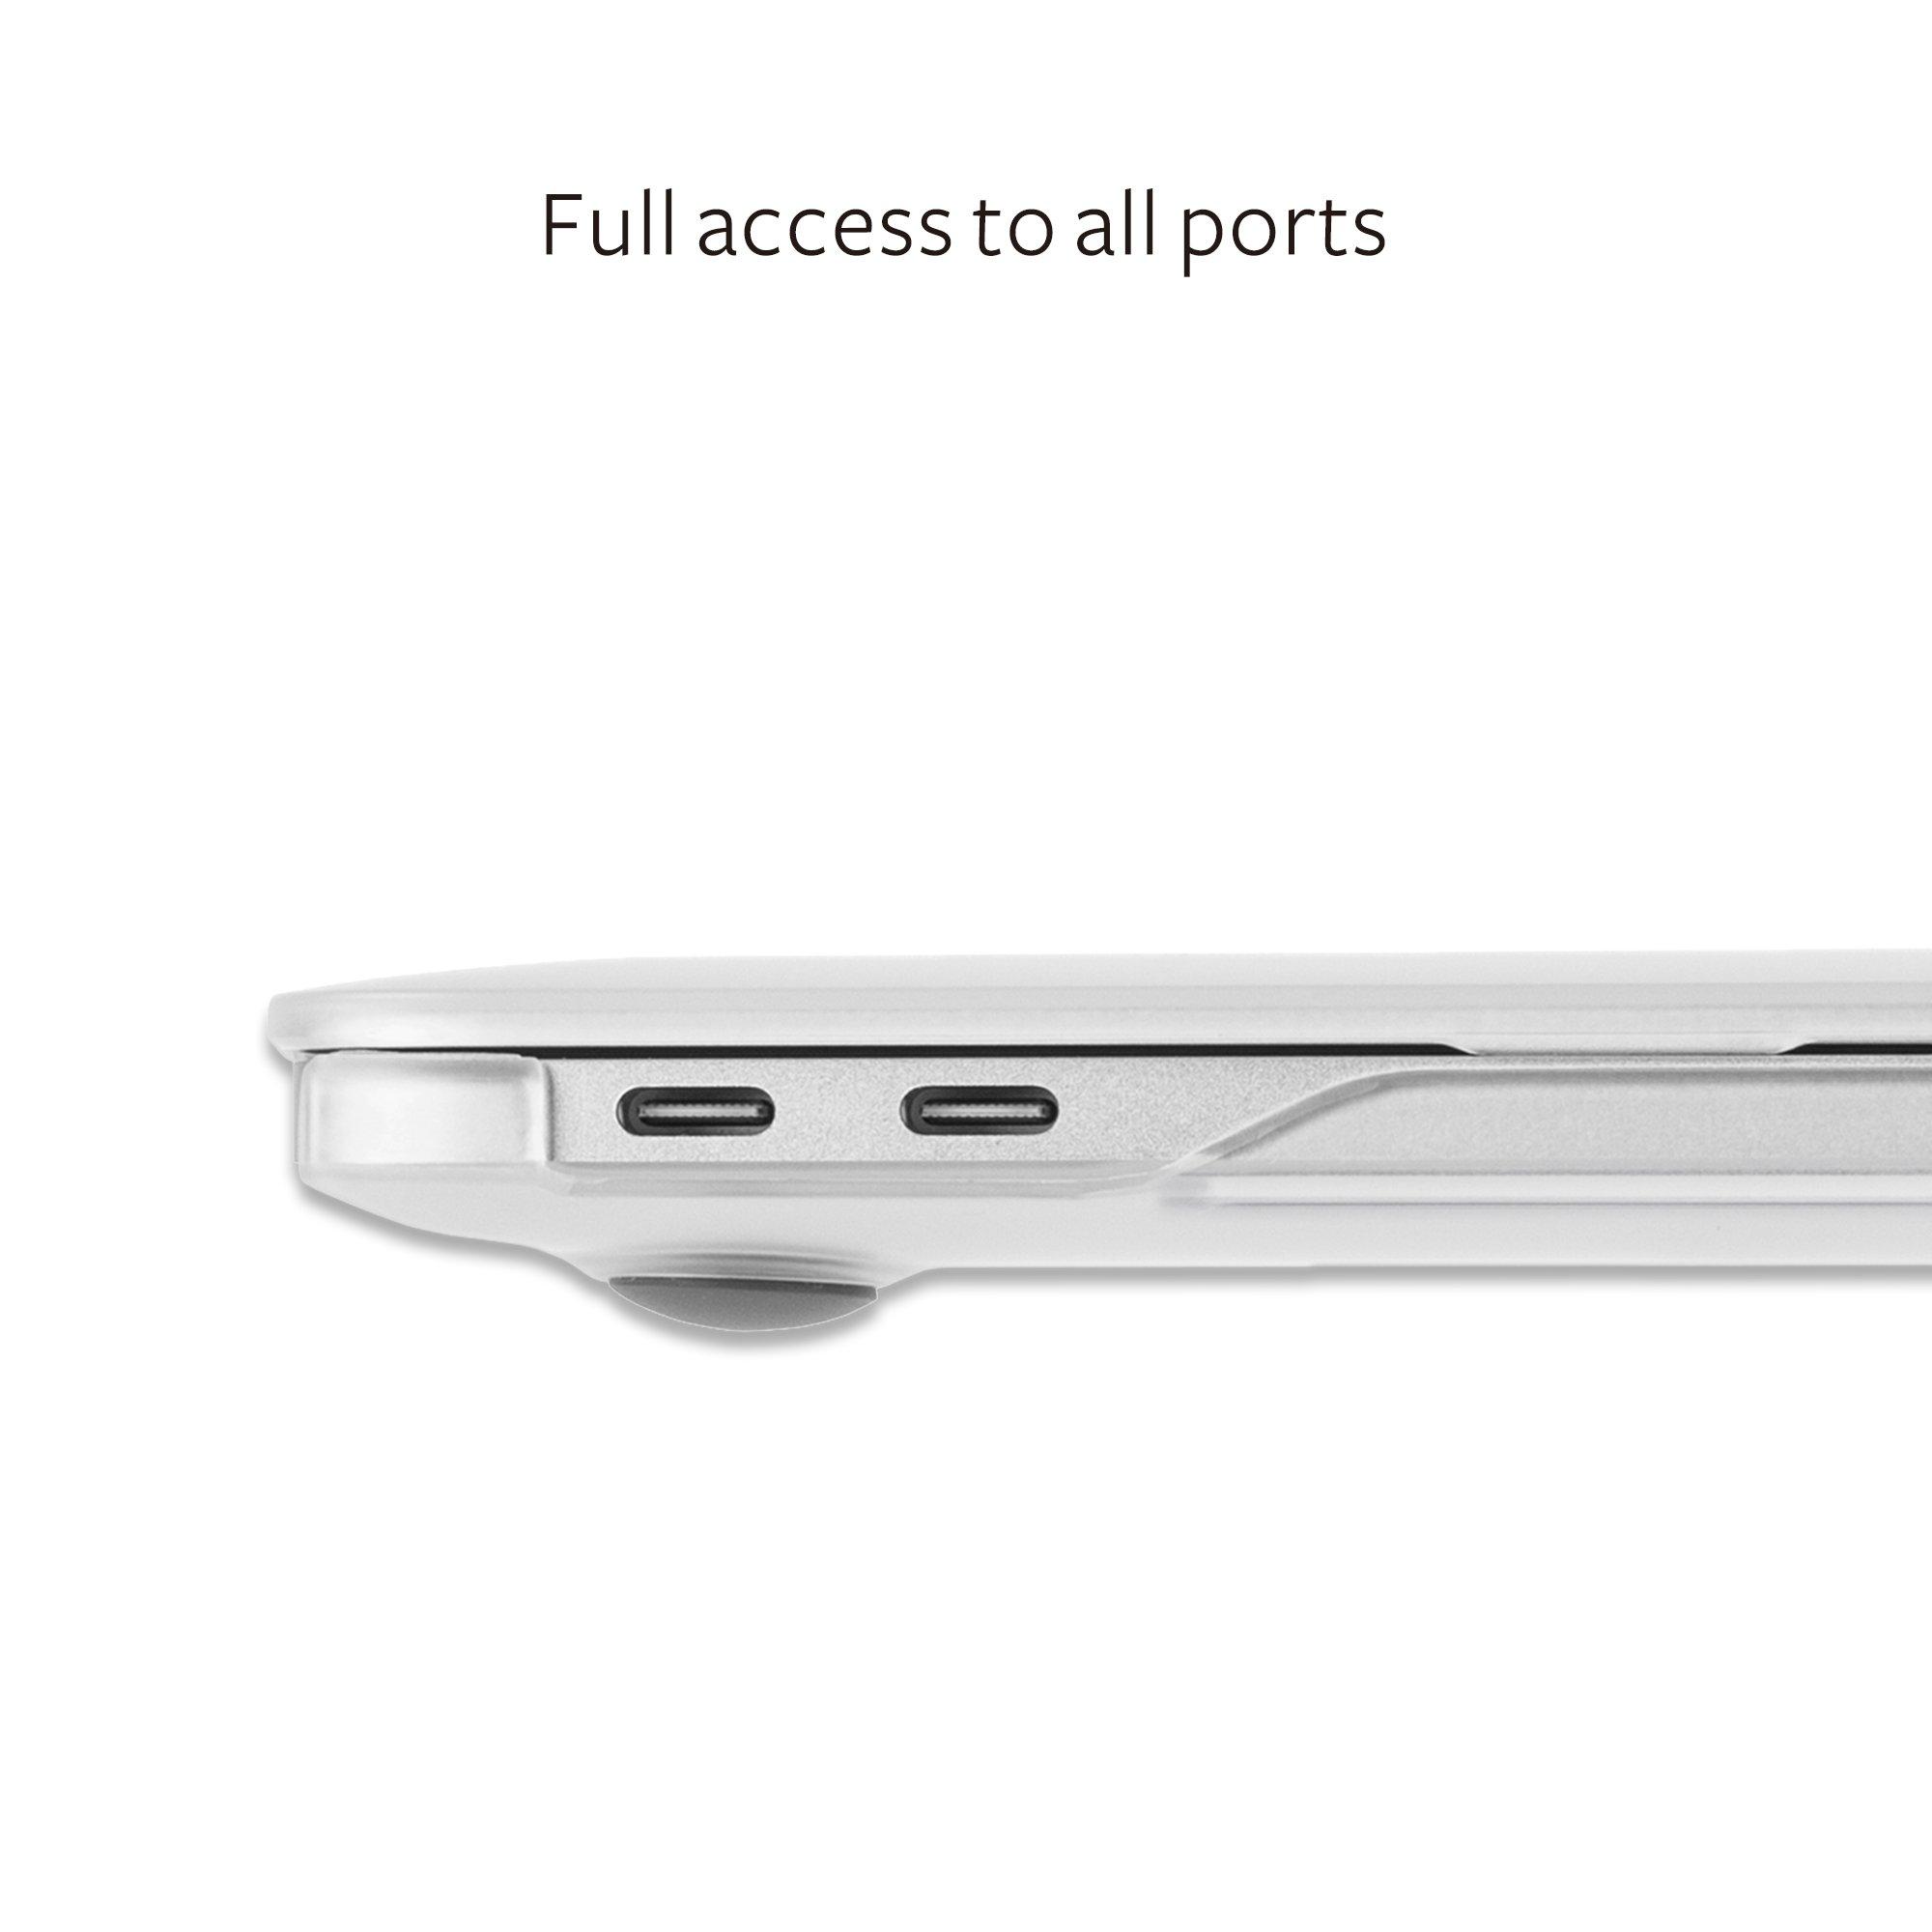 Moshi 99MO071006 iGlaze Hard Case for 2018 New MacBook Pro Retina 15'' & Thunderbolt 3 with Touch Bar, Stealth Black by Moshi (Image #7)